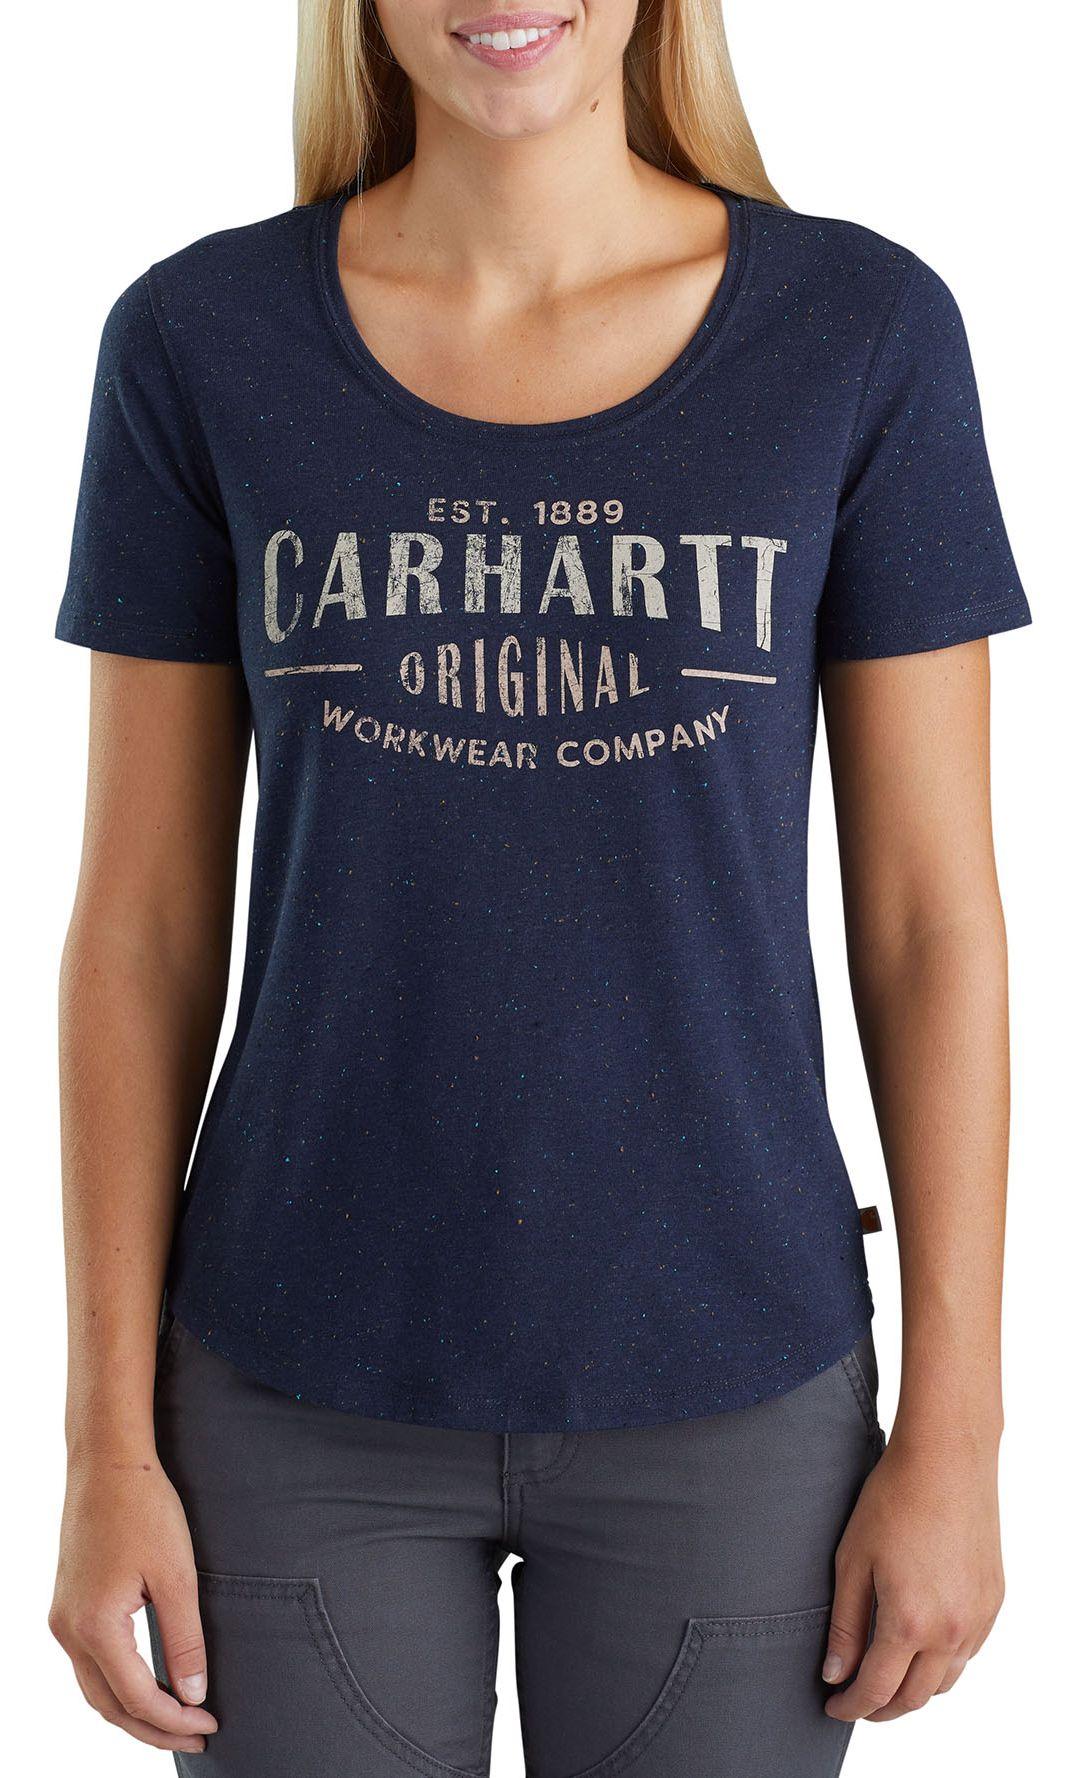 a8bfd8ec07 Women's Carhartt Graphic Workwear Short Sleeve T-   Field & Stream